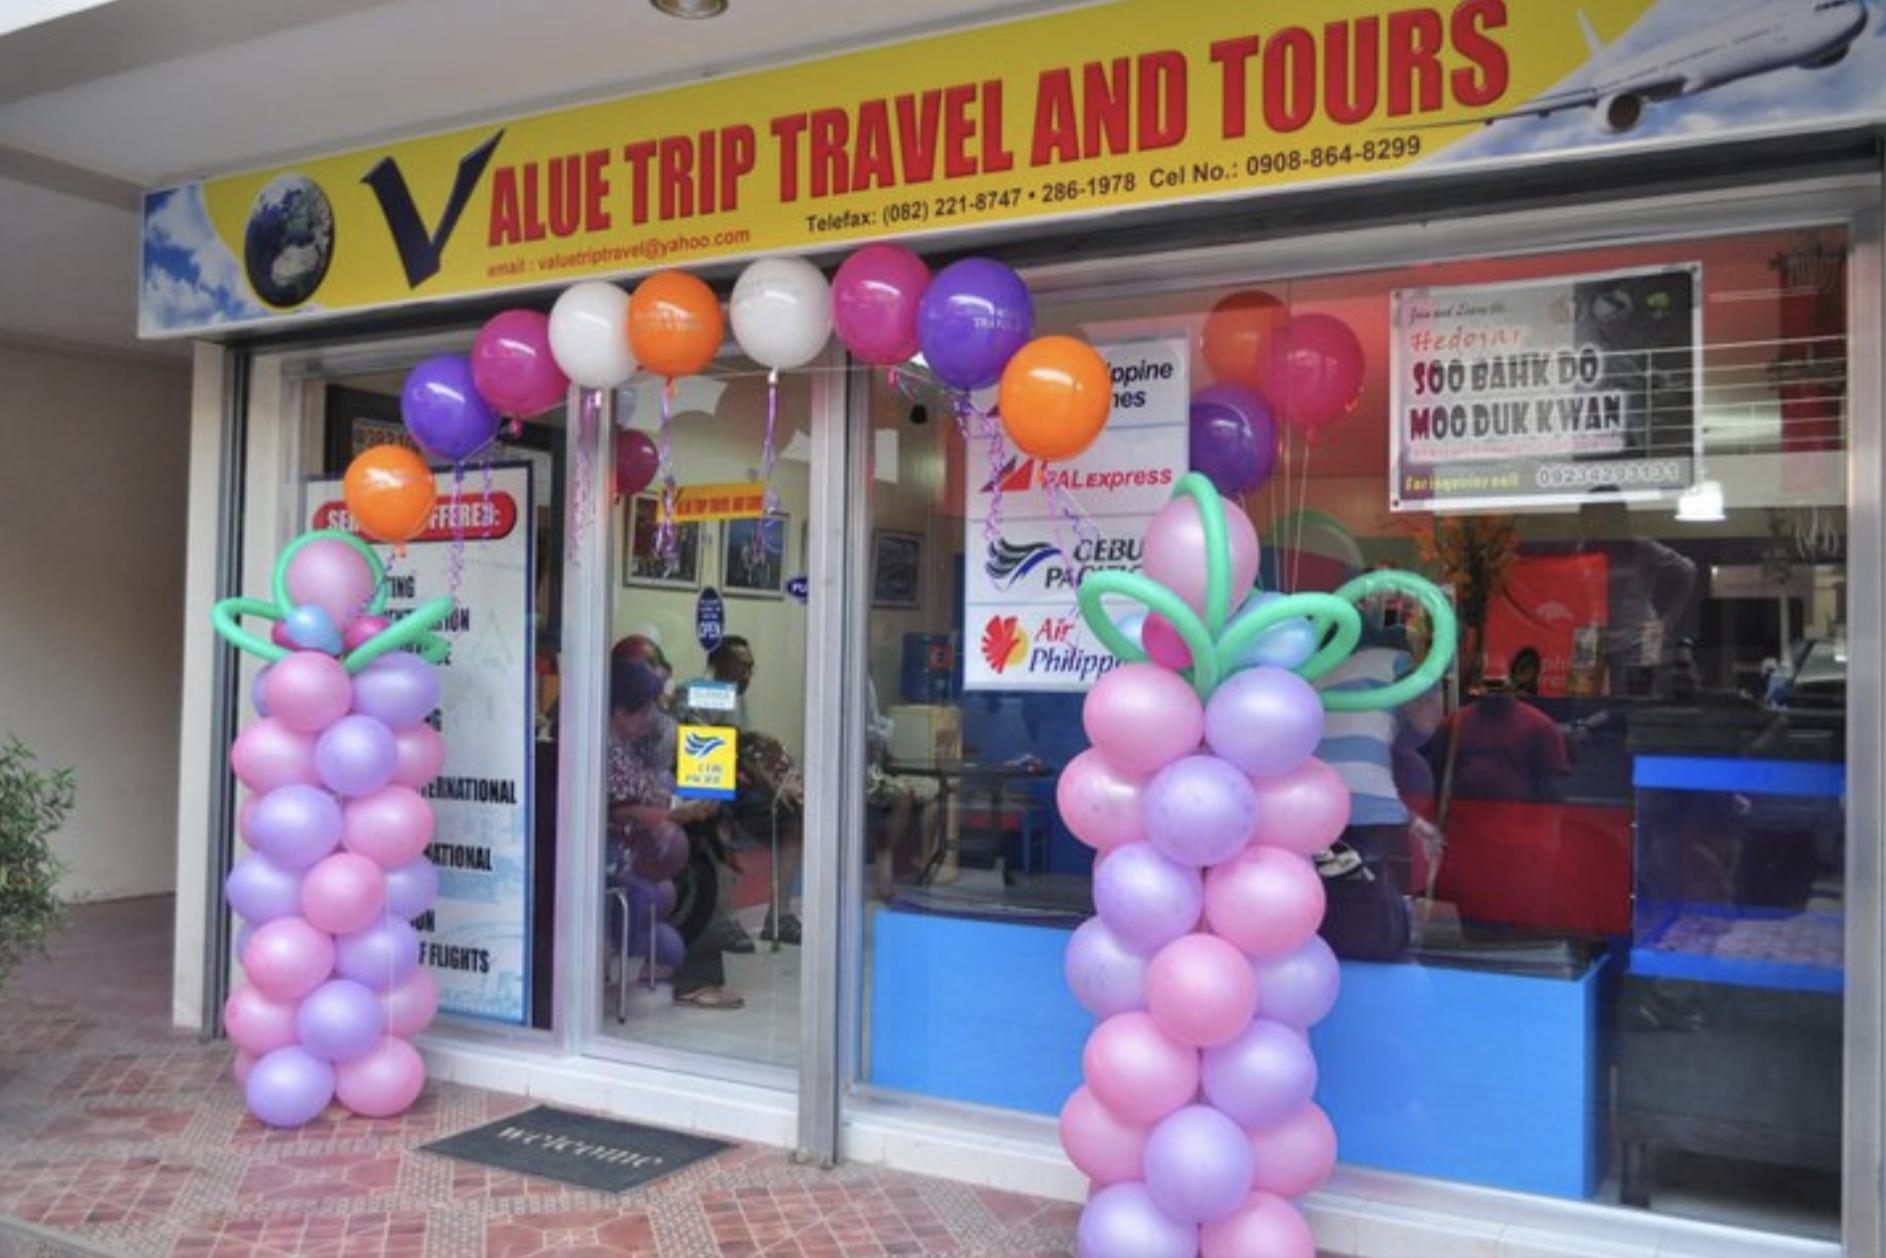 https://tourism.davaocity.gov.ph/wp-content/uploads/2019/12/Screen-Shot-2019-12-16-at-1.53.15-PM.png